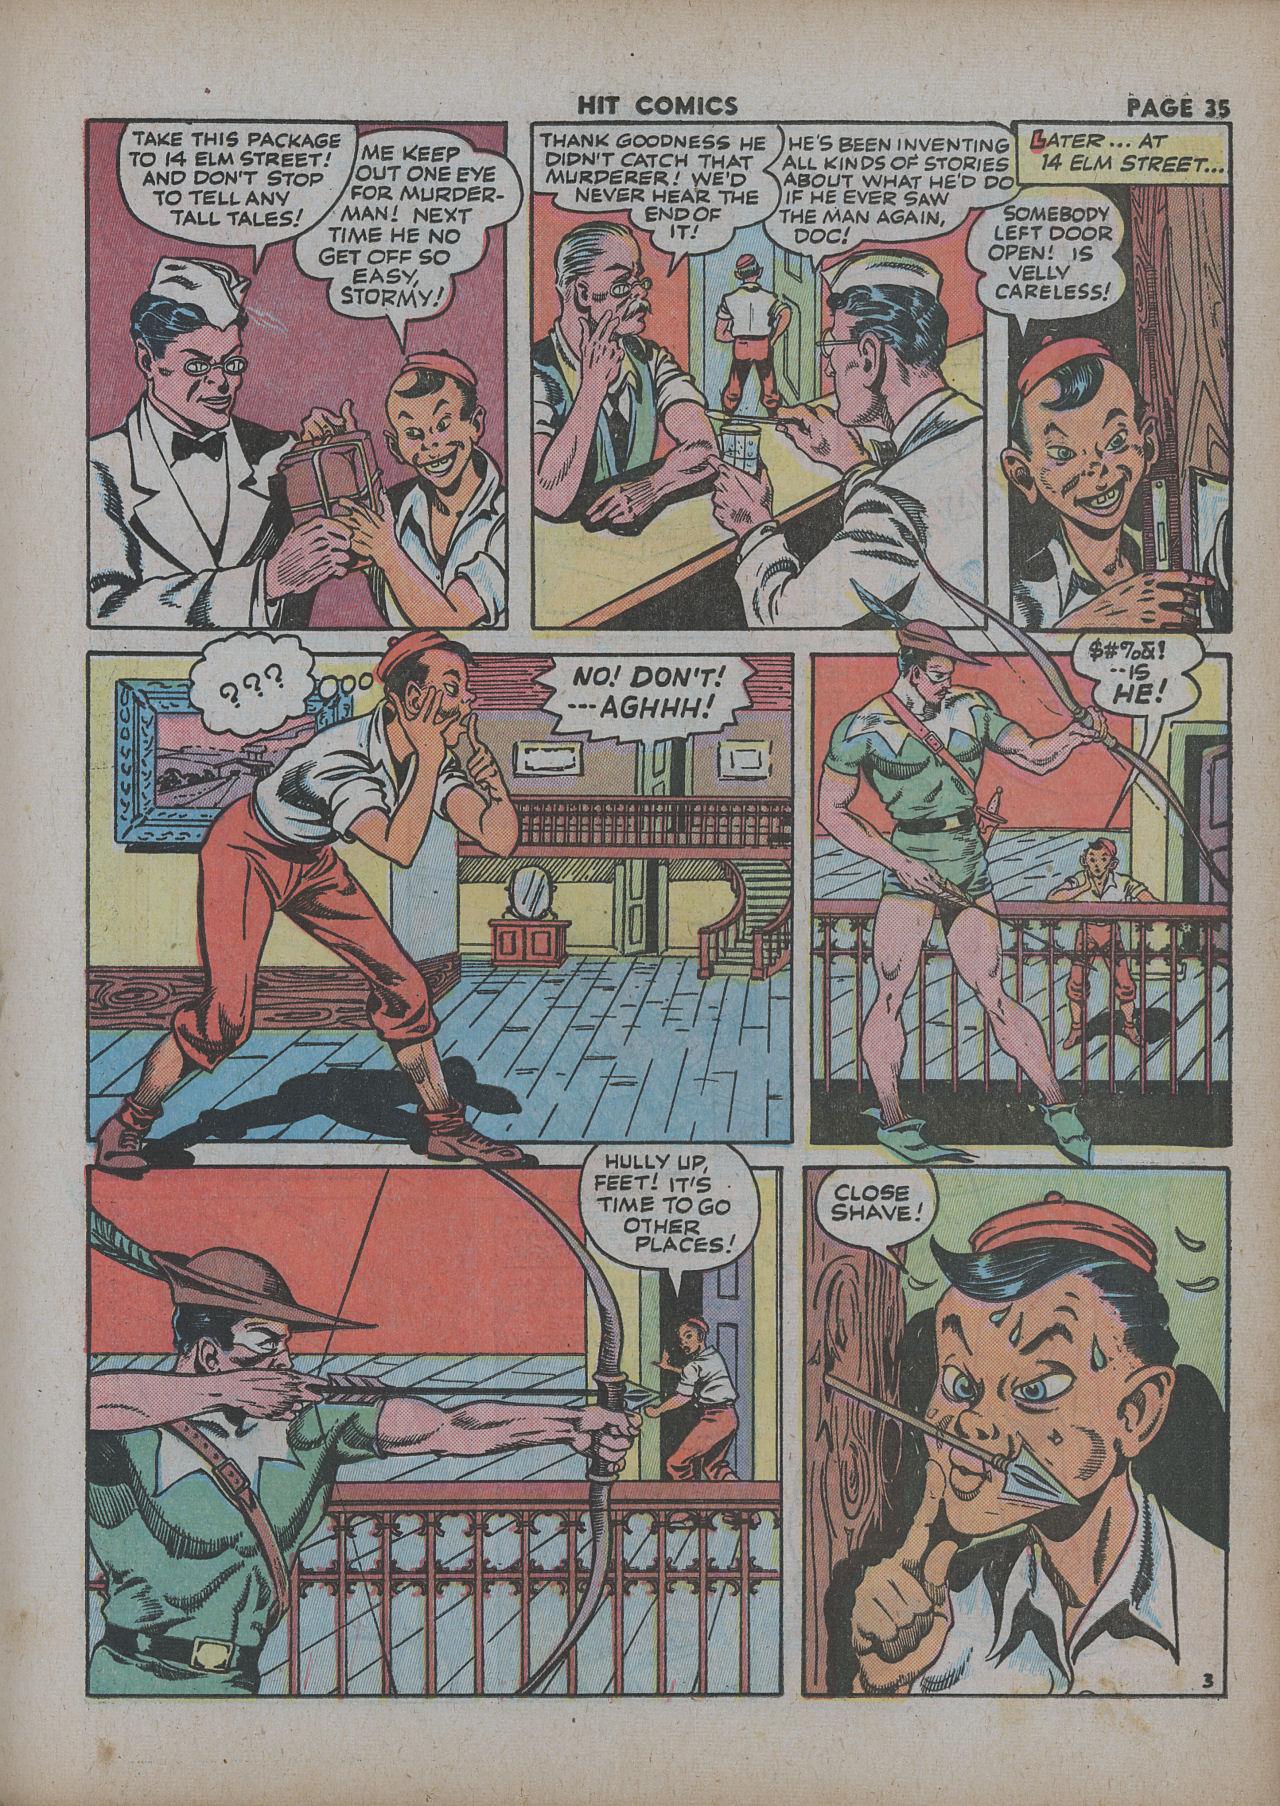 Read online Hit Comics comic -  Issue #27 - 37